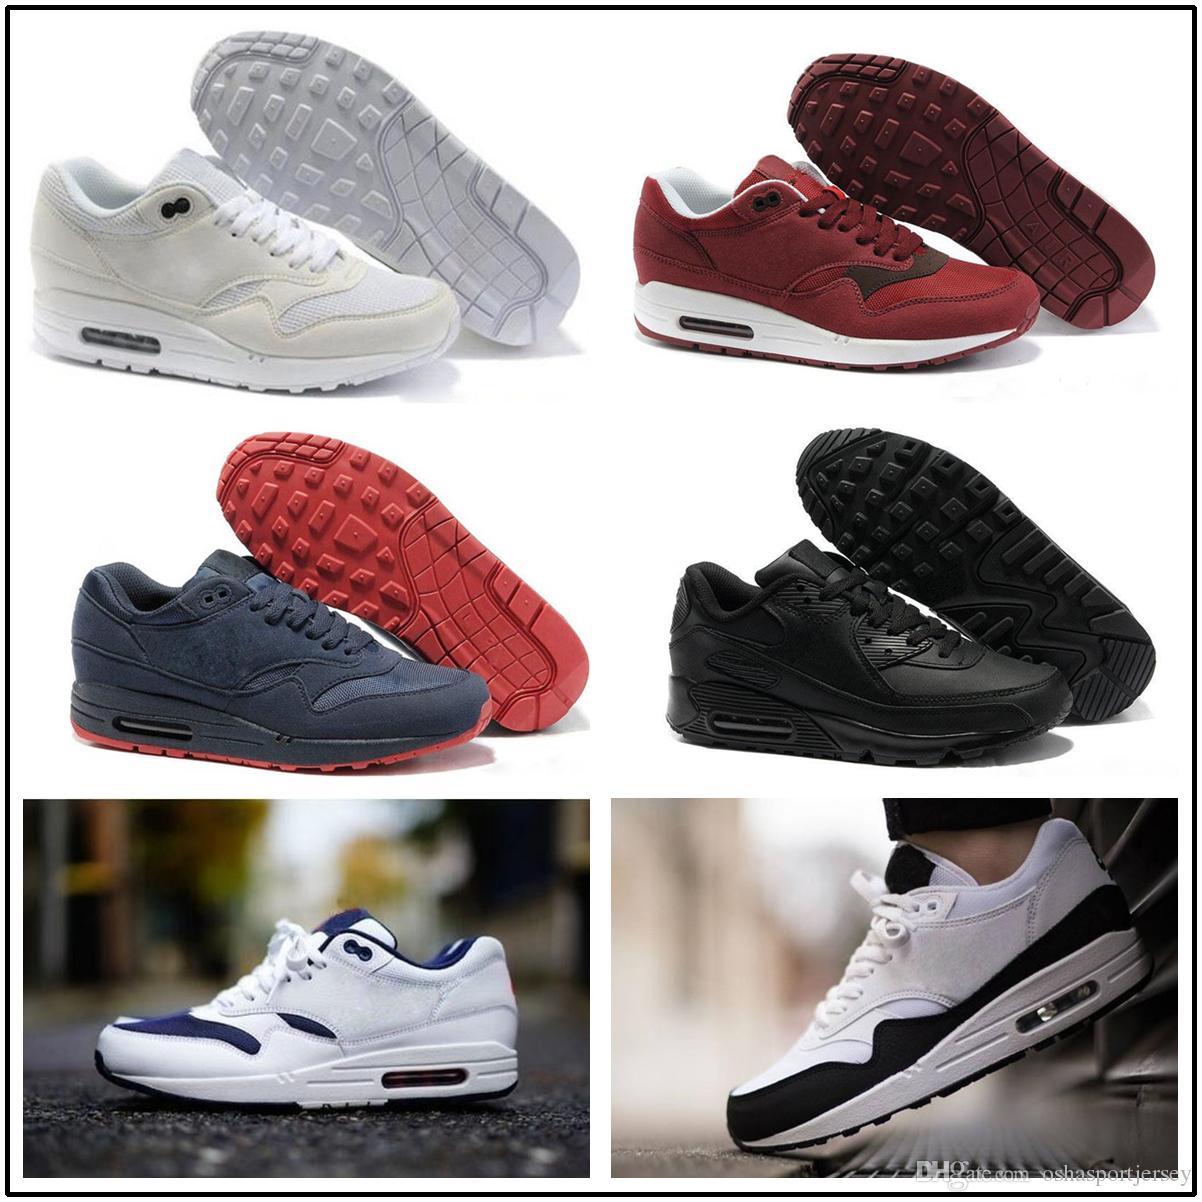 90 Hombres 87 Ultra OG QS EE. UU. Camo Zapatos para correr Moda Cultura callejera Deportes al aire libre Deportes de alta calidad zapatos deportivos